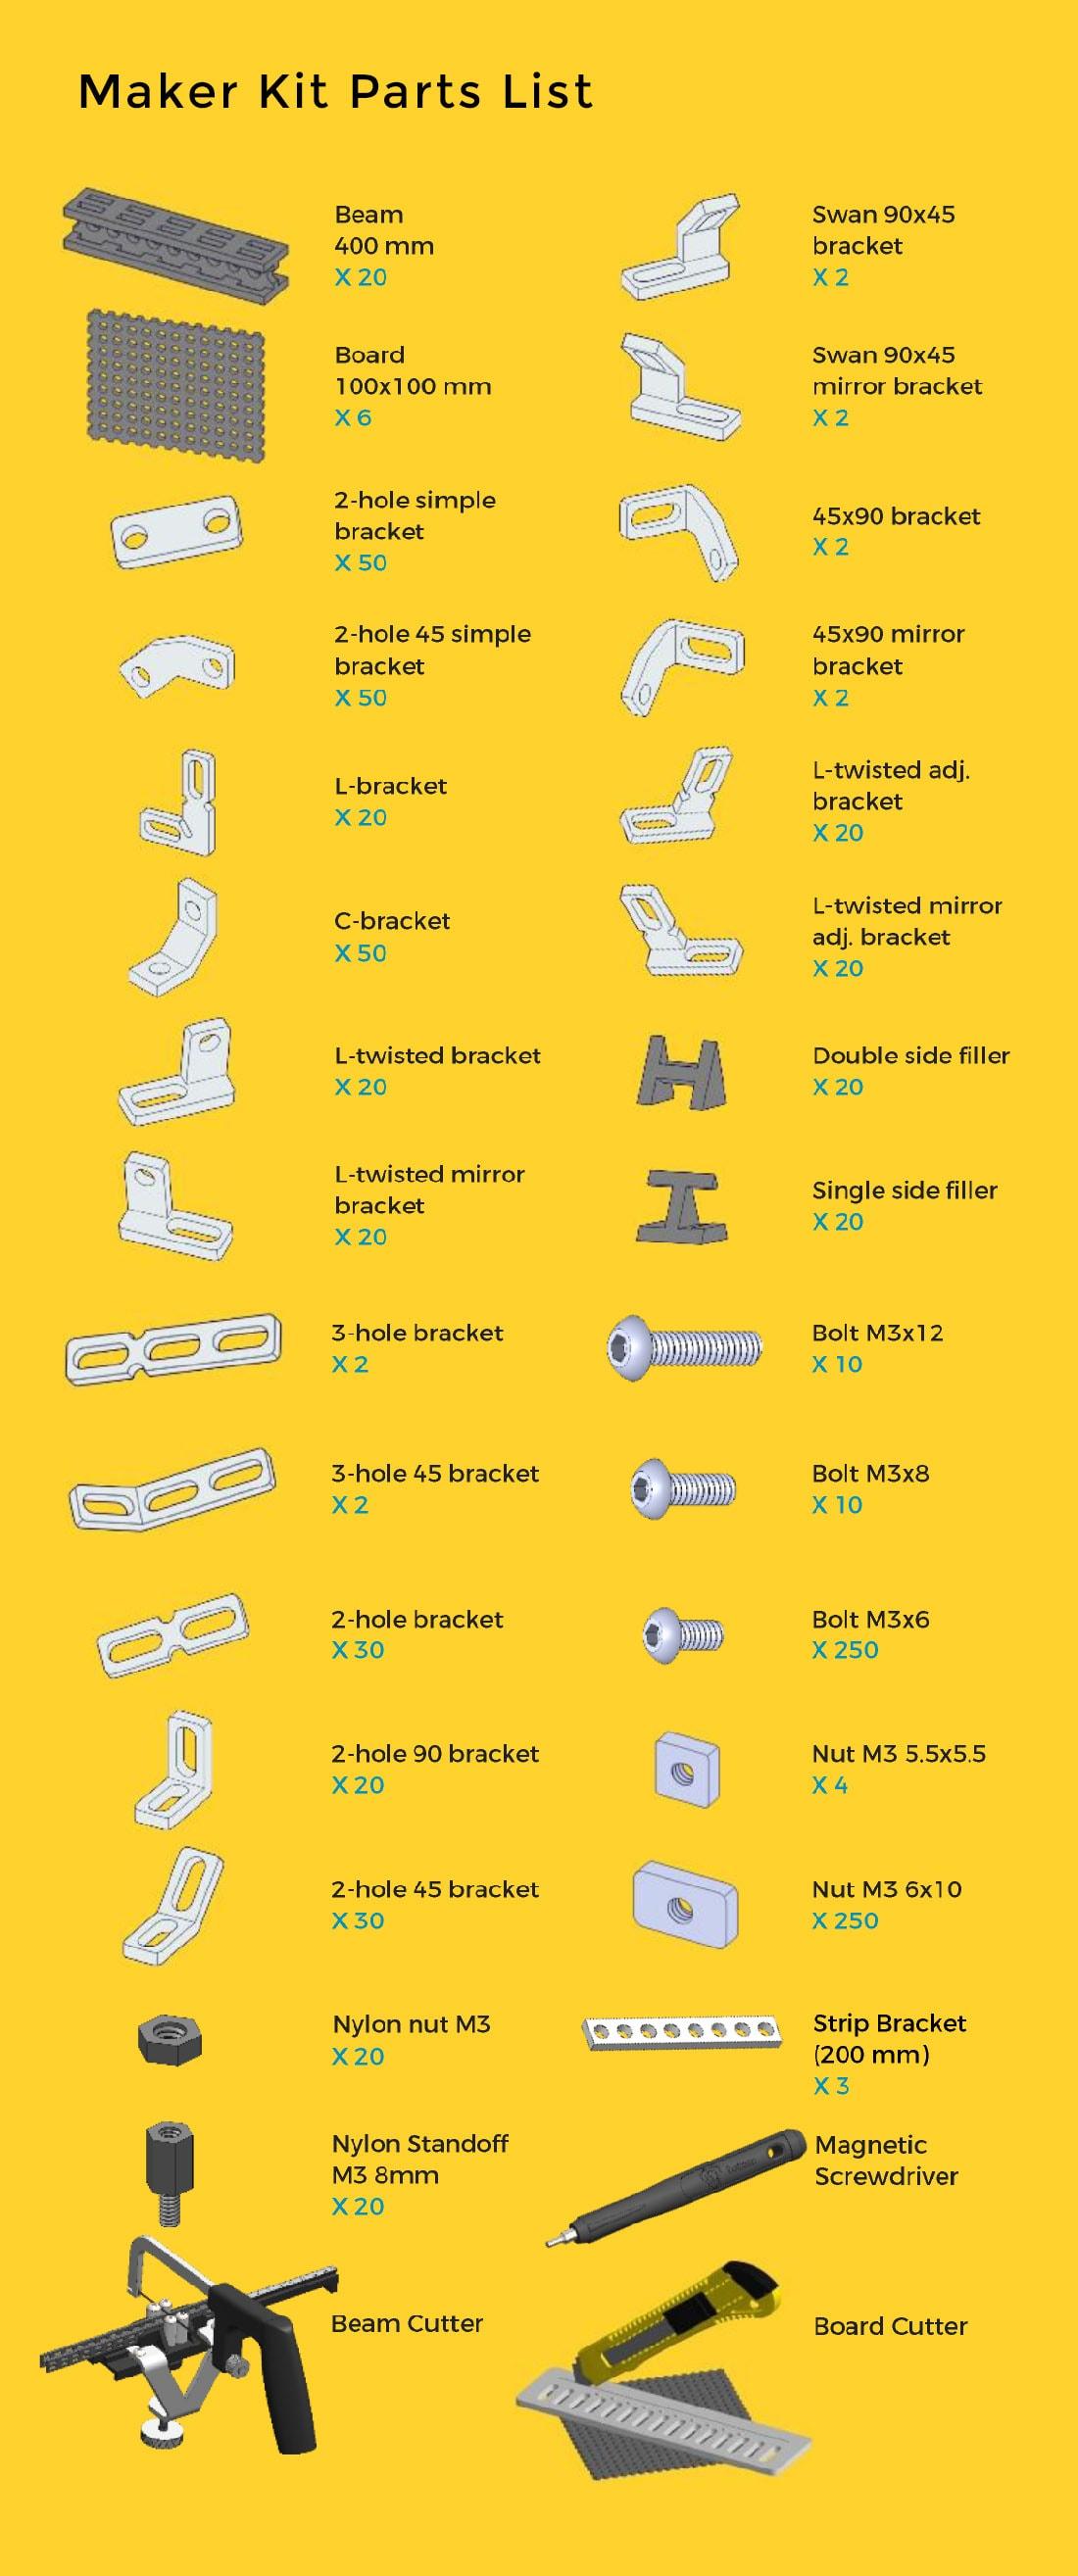 Totem-Maker-Kit-parts-list